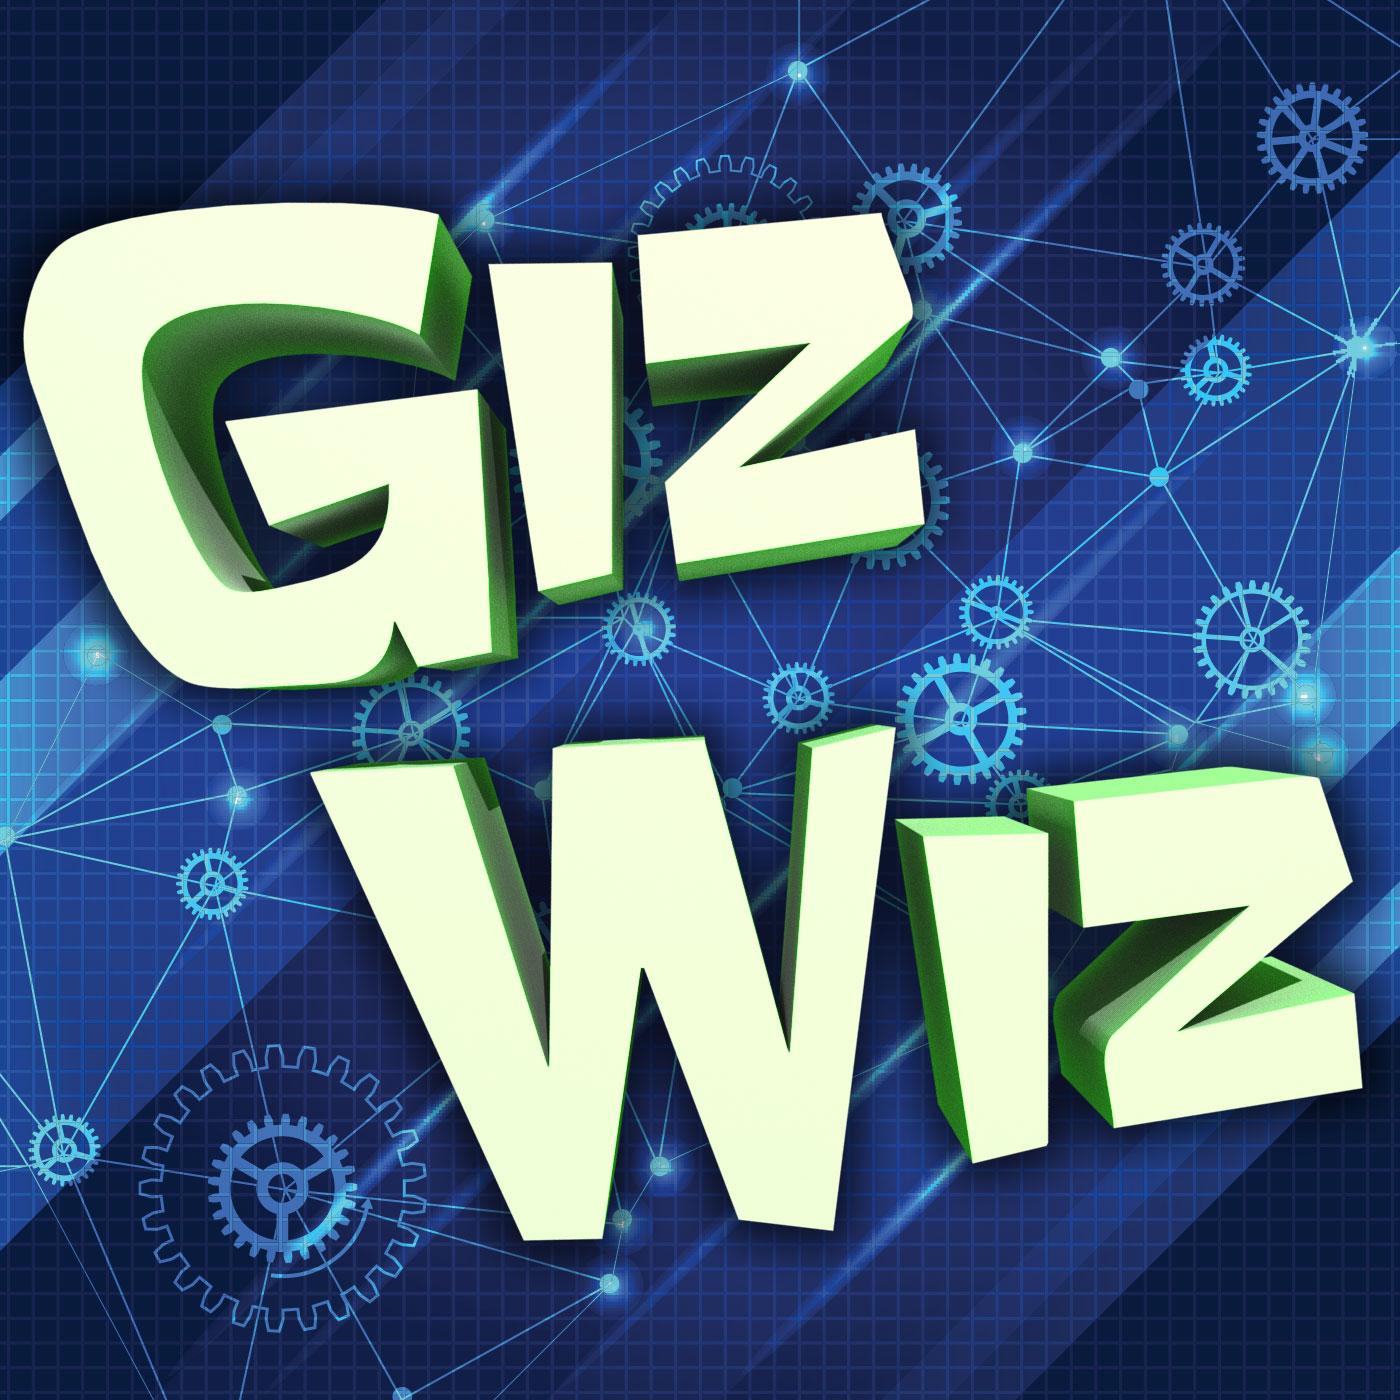 The Giz Wiz (Audio)